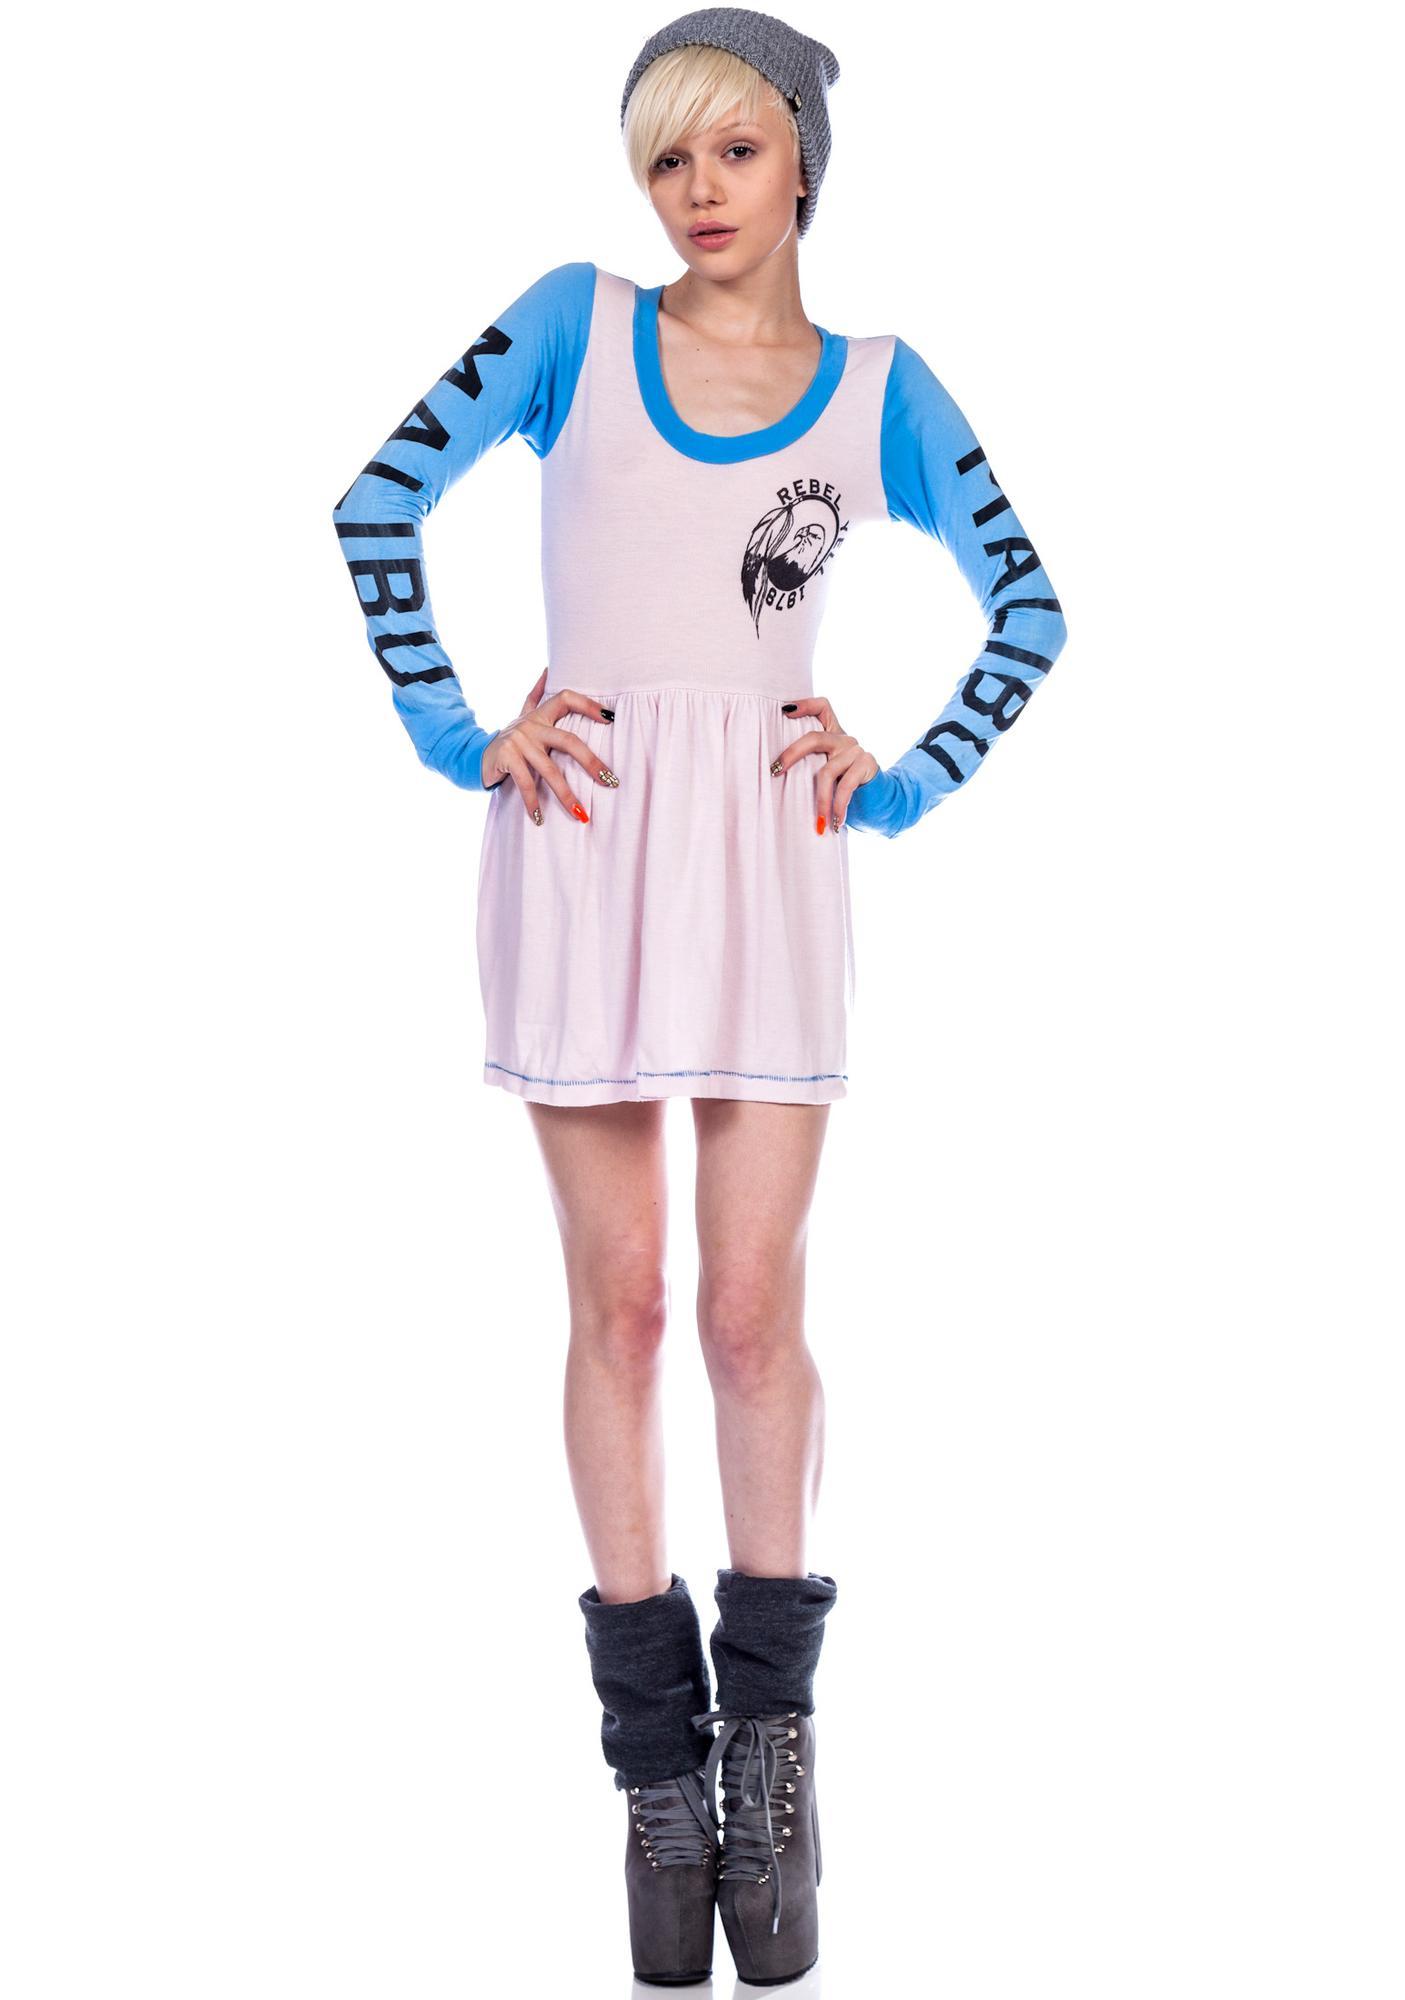 Rebel Yell Track and Field Mini Dress